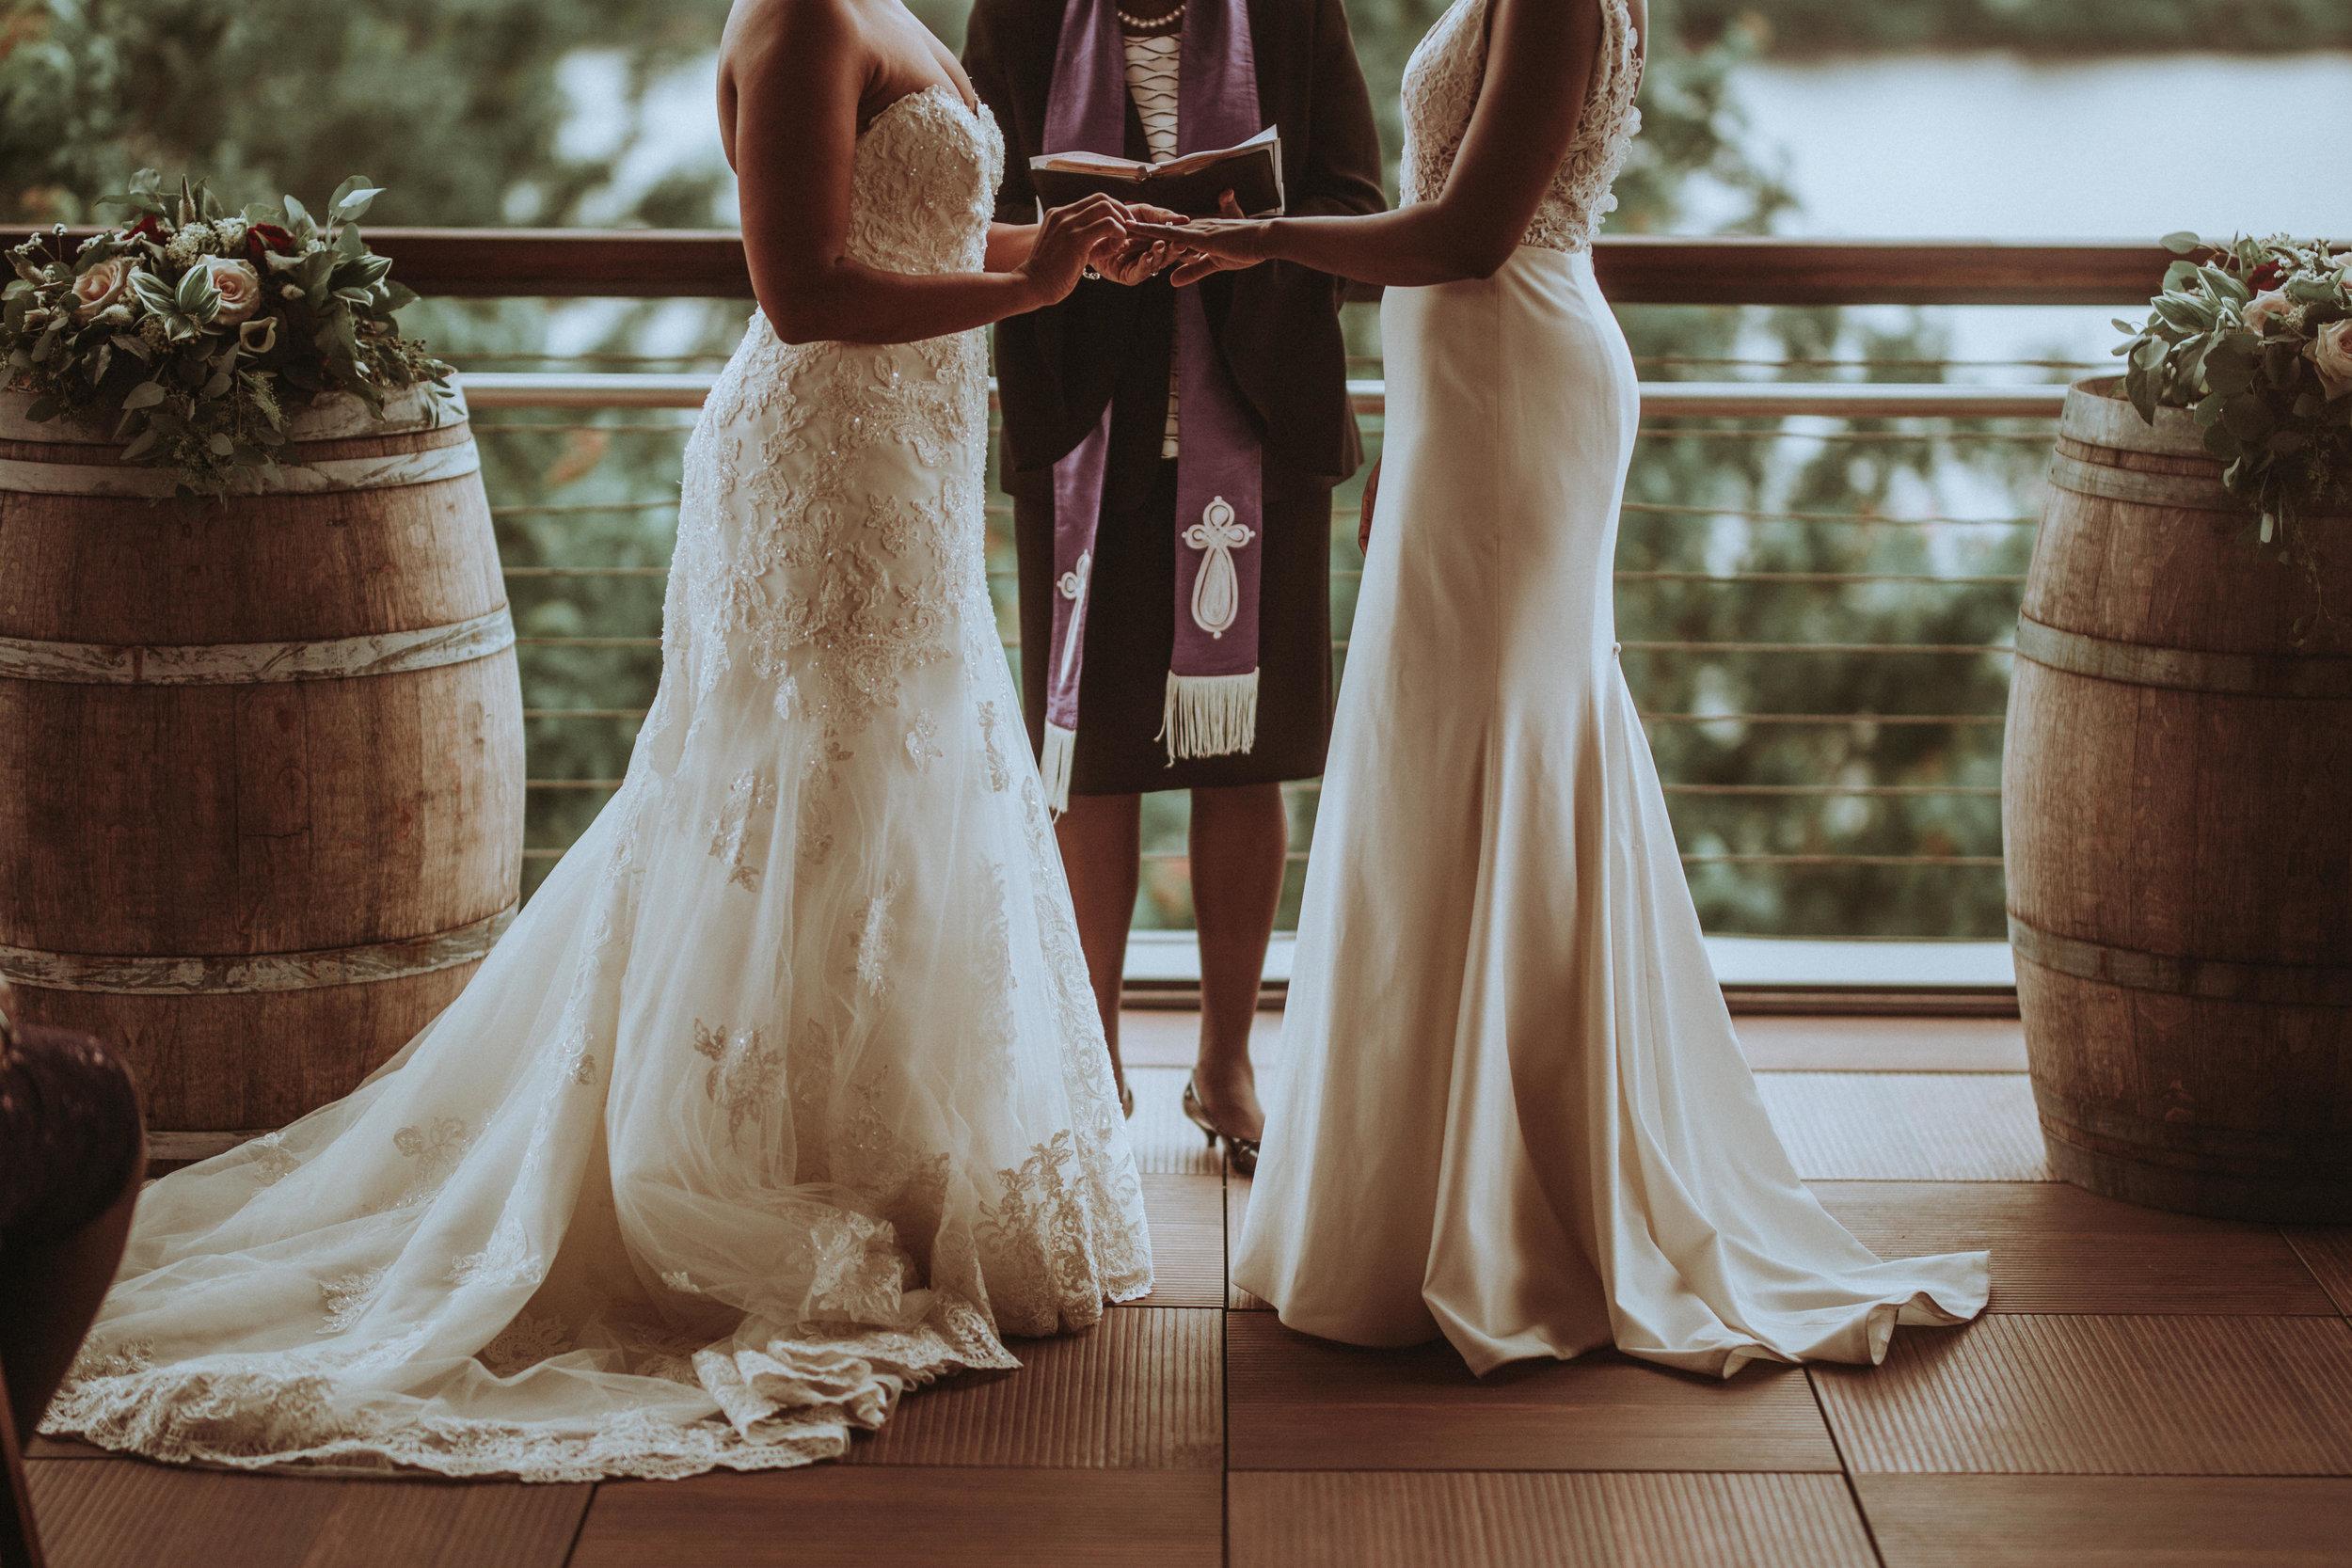 BHUNTERco_2018_Weddings_Keri_Kieu_308.jpg